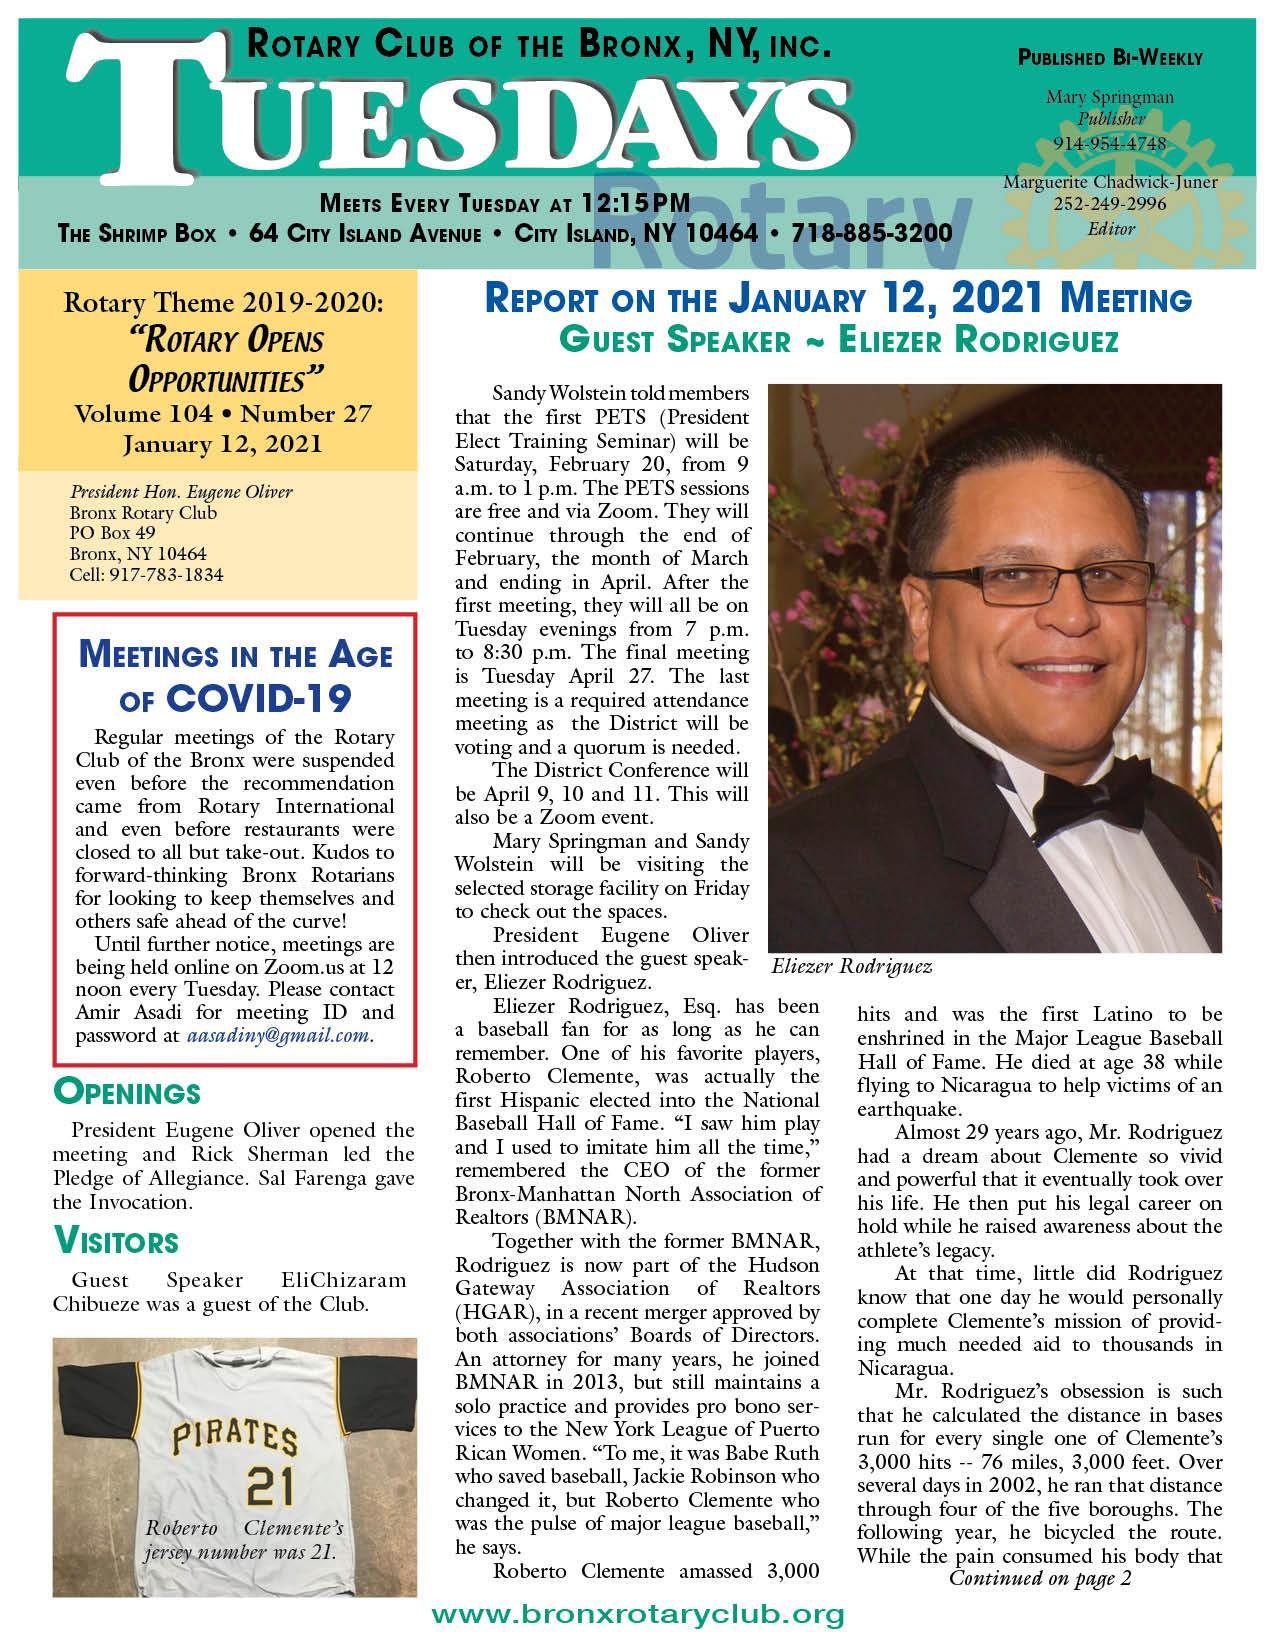 Tuesdays newsletter 1/12 & 1/19/2021 p1